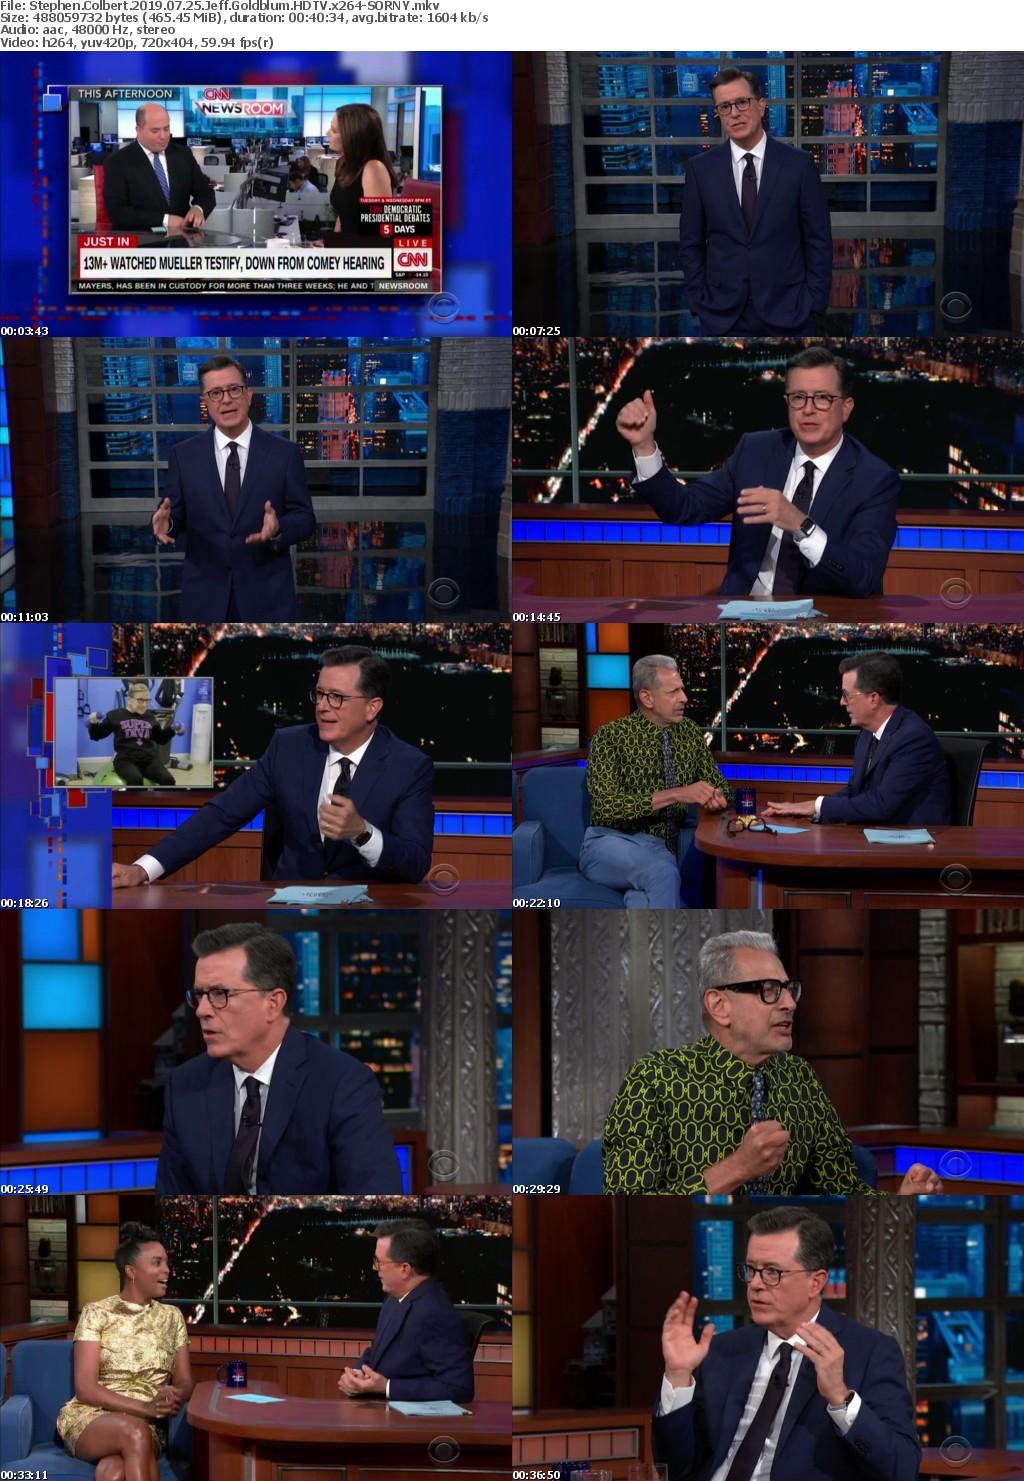 Stephen Colbert 2019 07 25 Jeff Goldblum HDTV x264-SORNY